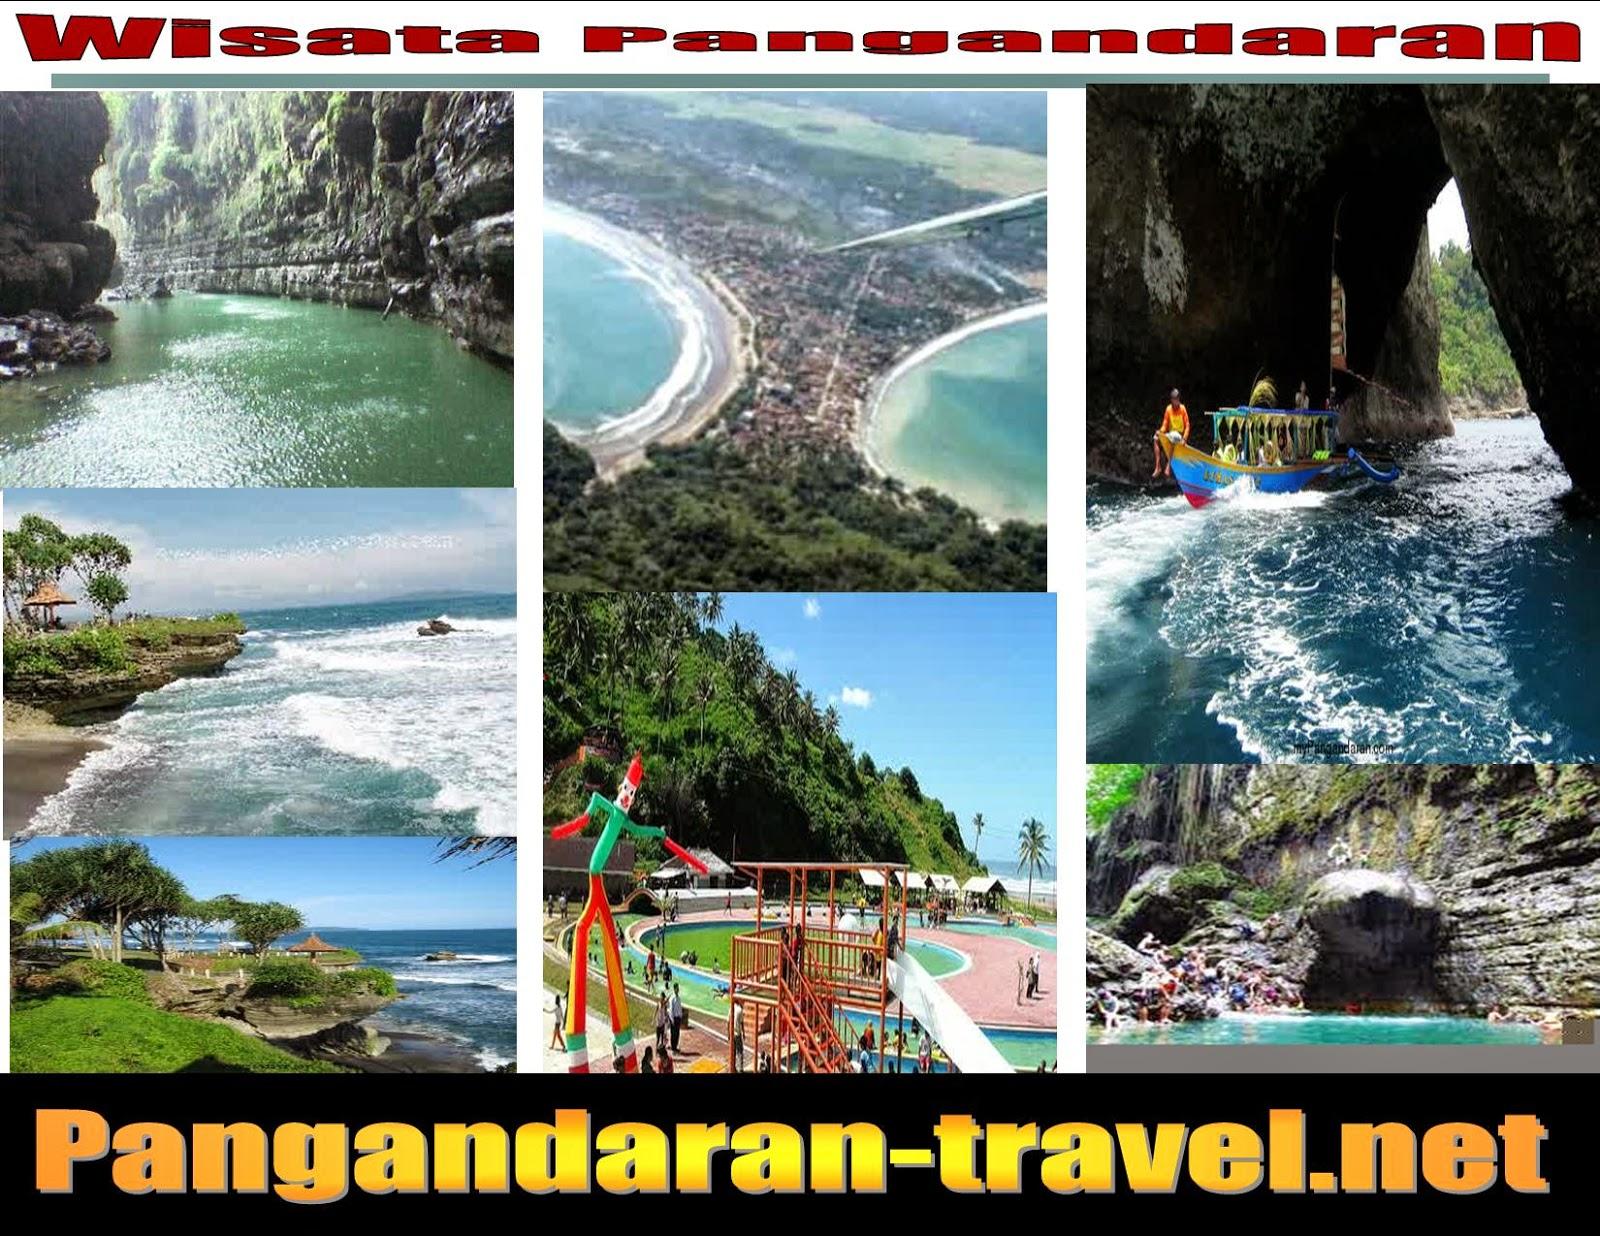 http://pangandaran-travel.net/